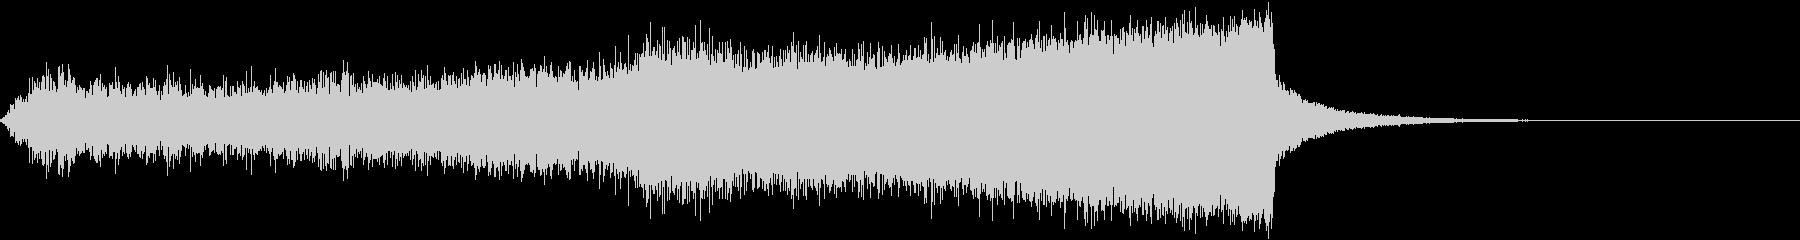 CINEMATIC RISER_32の未再生の波形